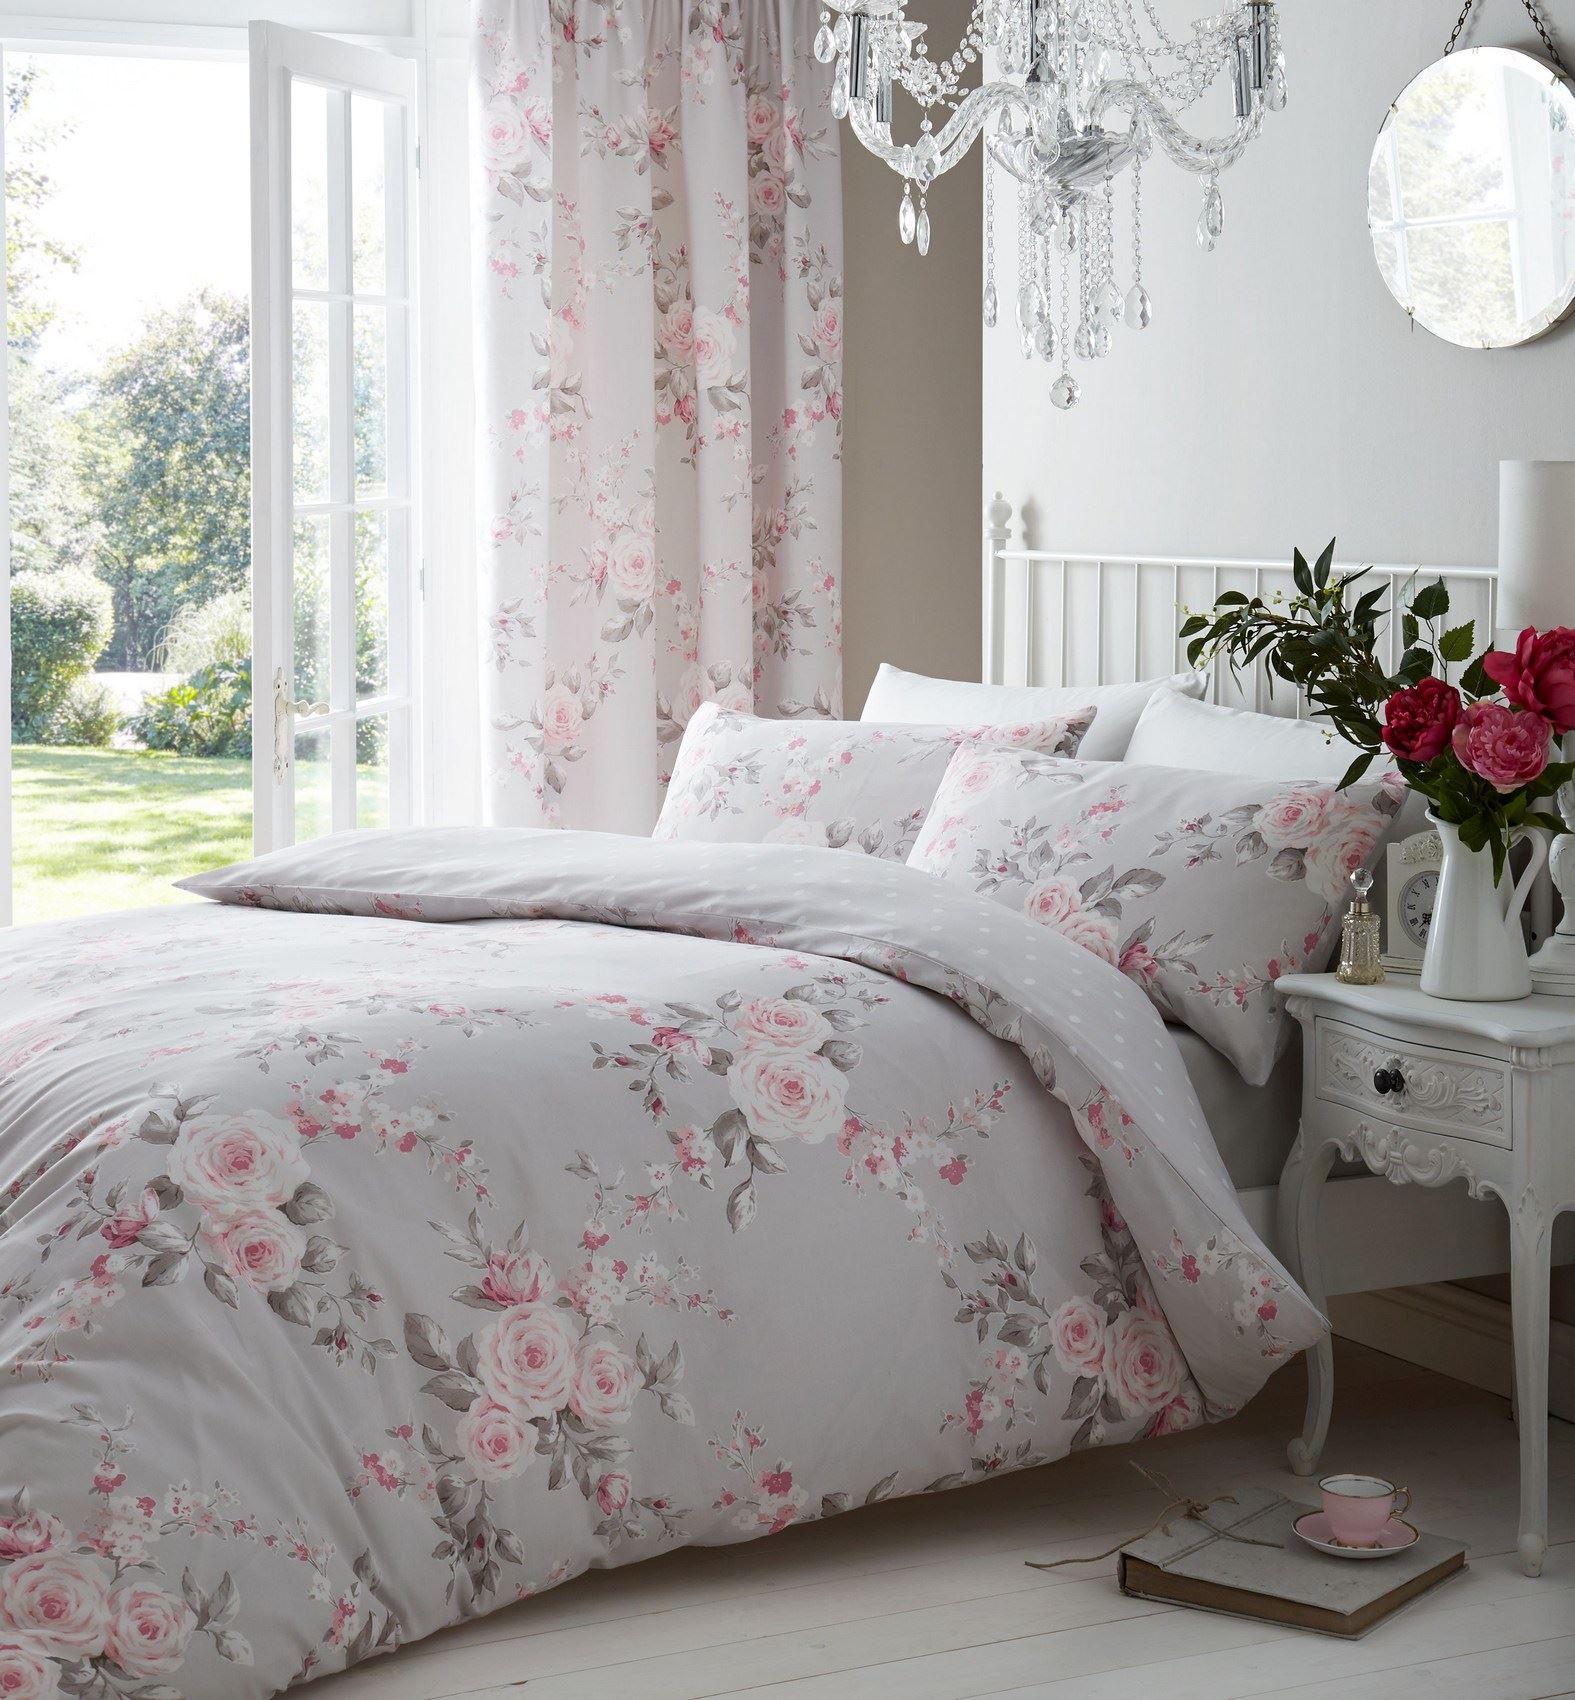 Fresh Pink Flower Duvet Cover - Sweetgalas BT12